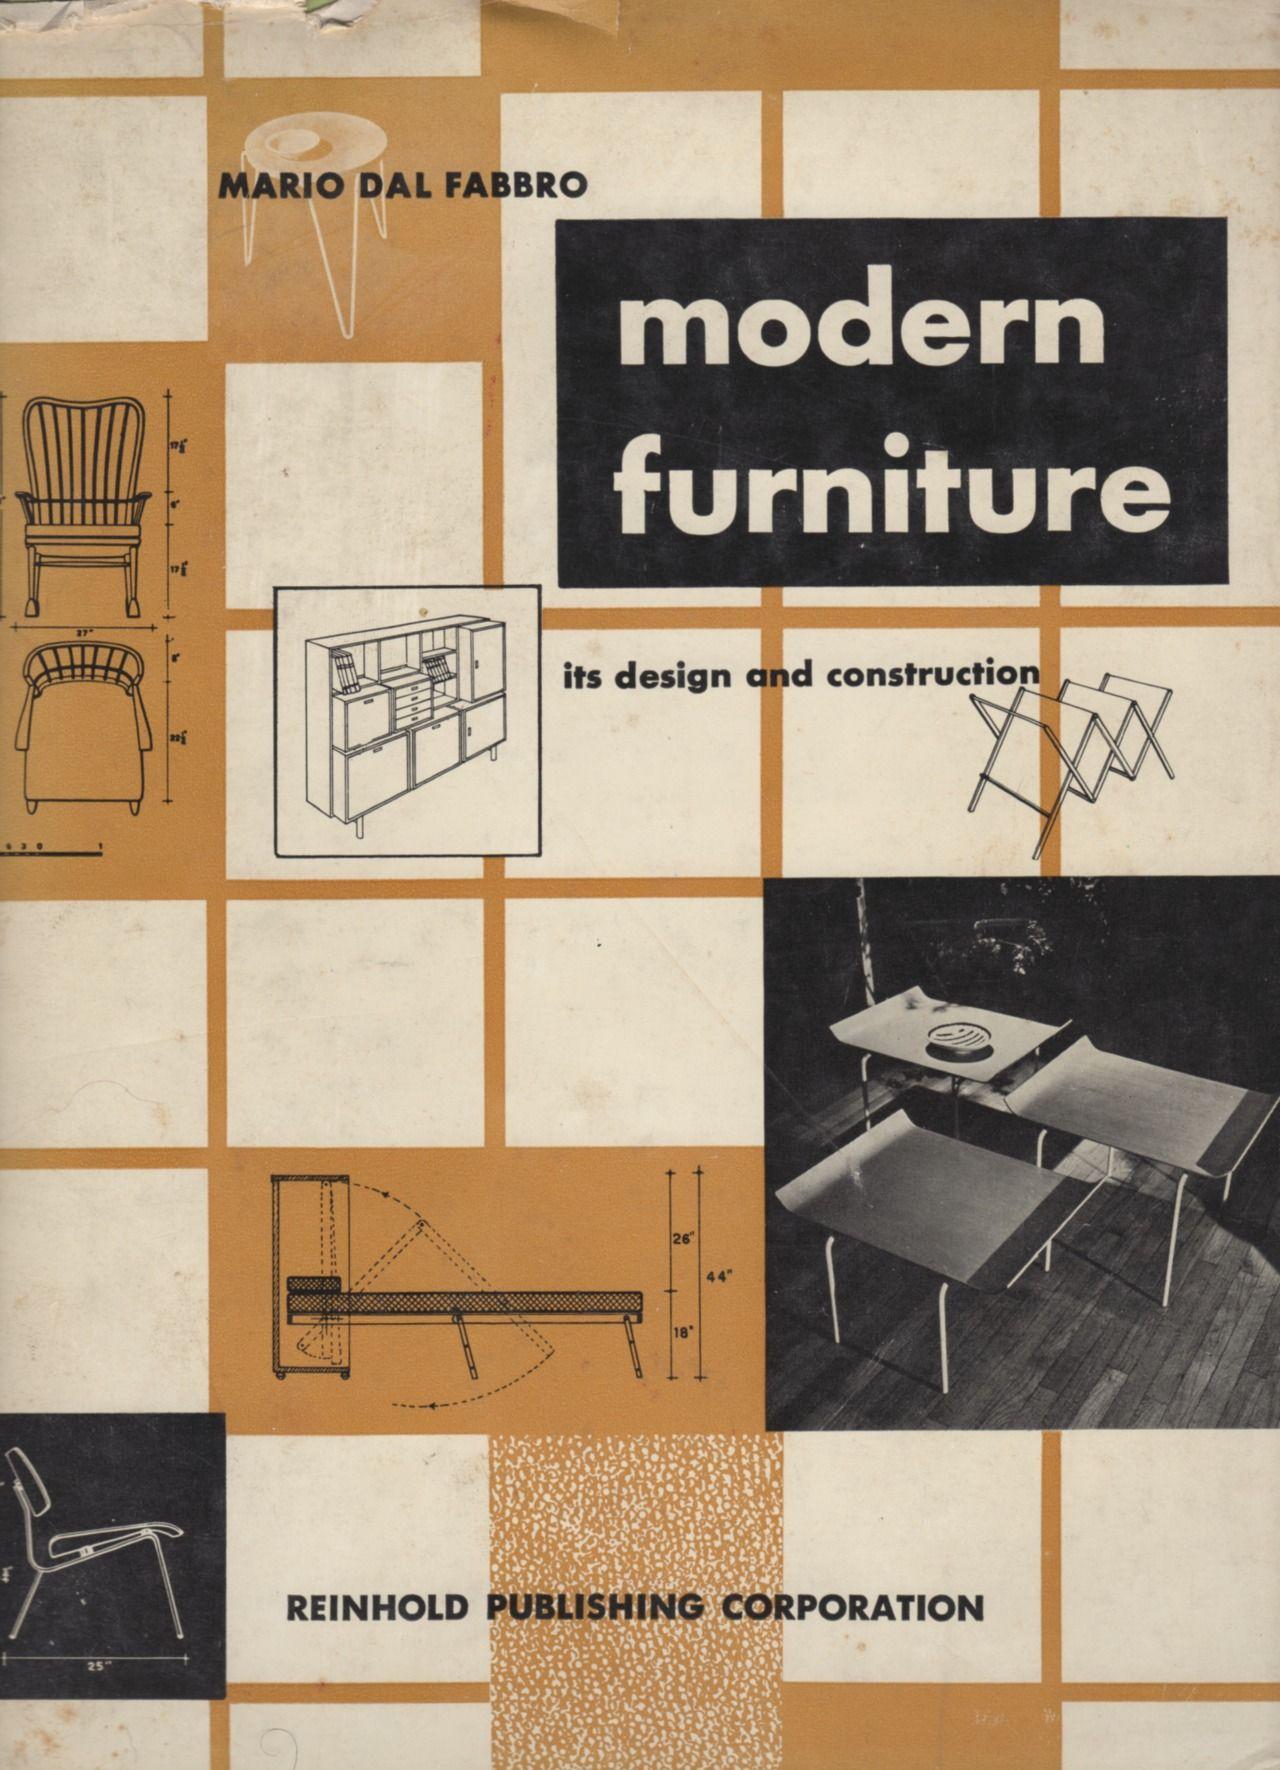 Modern furniture by mario dal fabbro reinhold publishing 1949